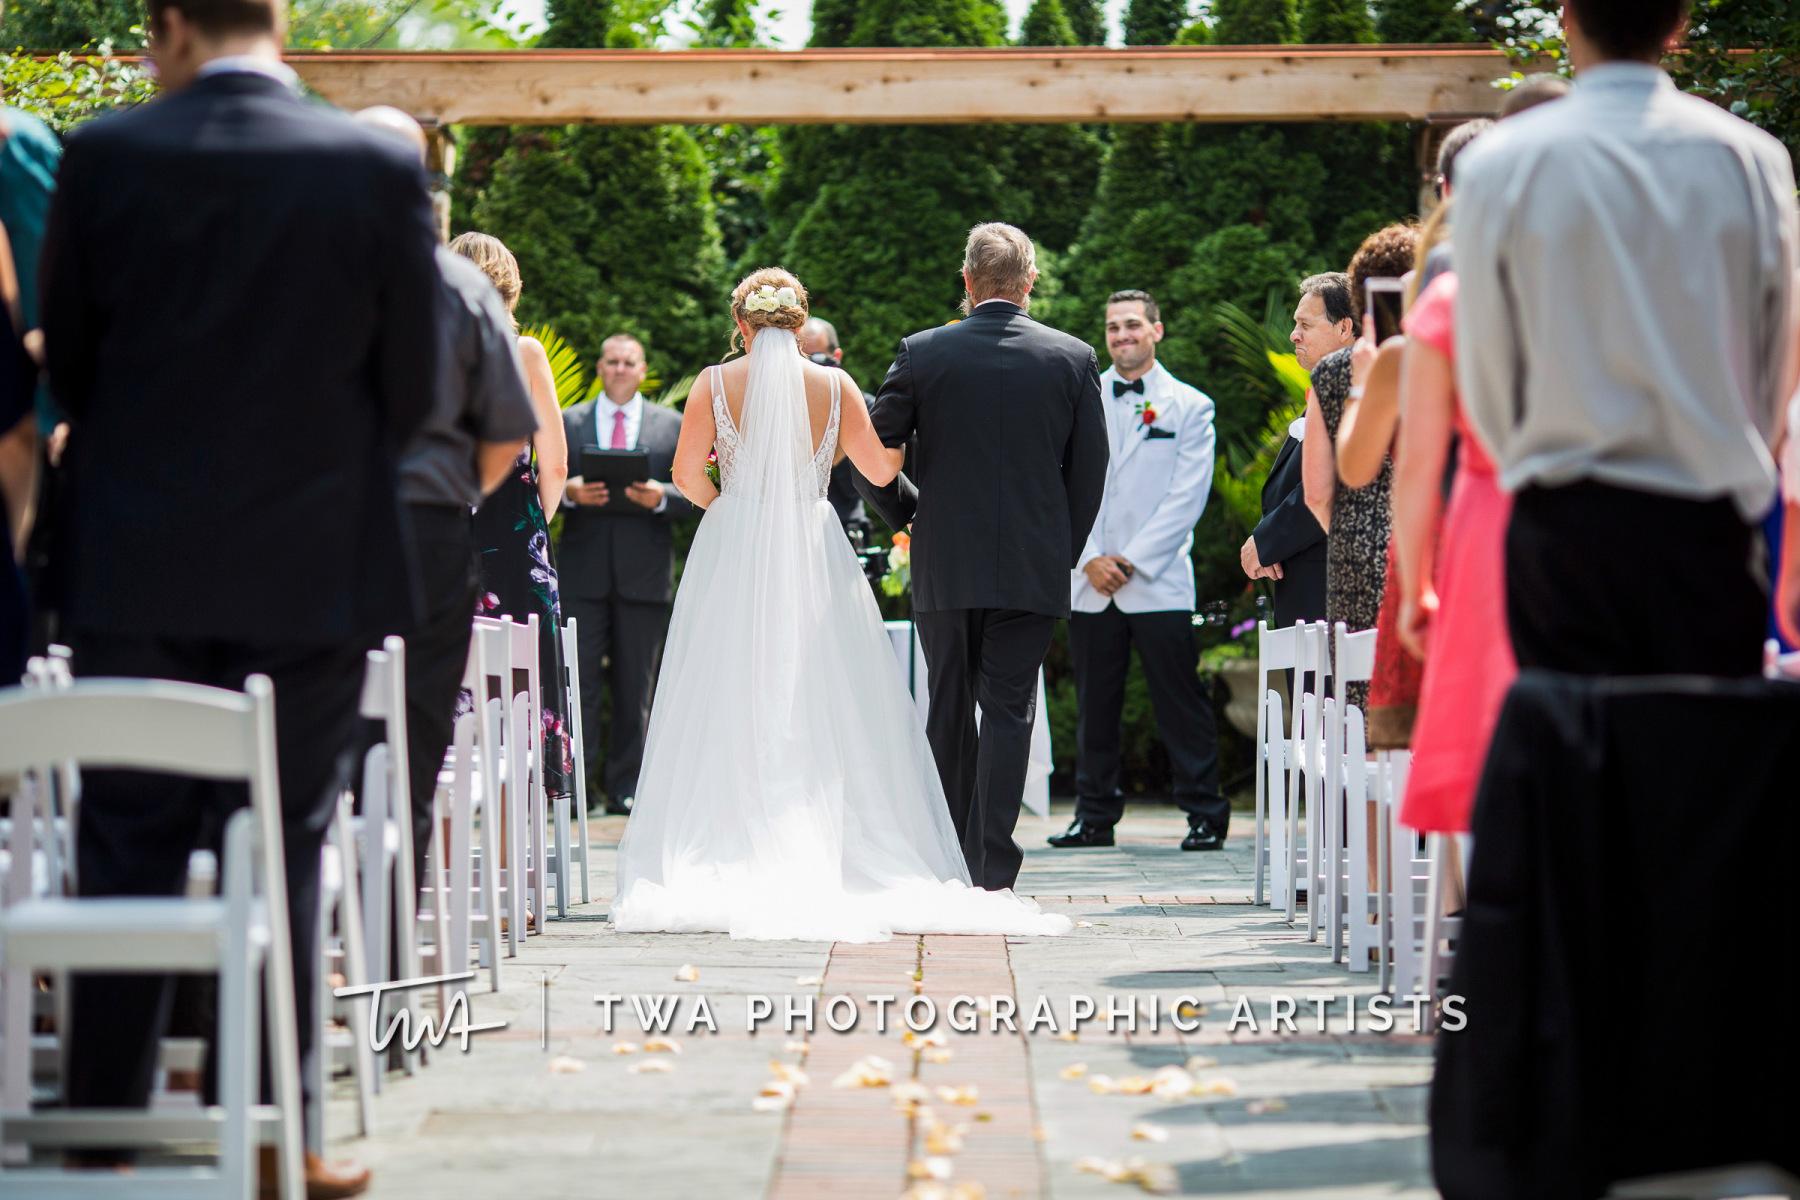 Chicago-Wedding-Photographers-Renaissance-Hotel_Hohensee_Fleishman_JG_DK-021-1102